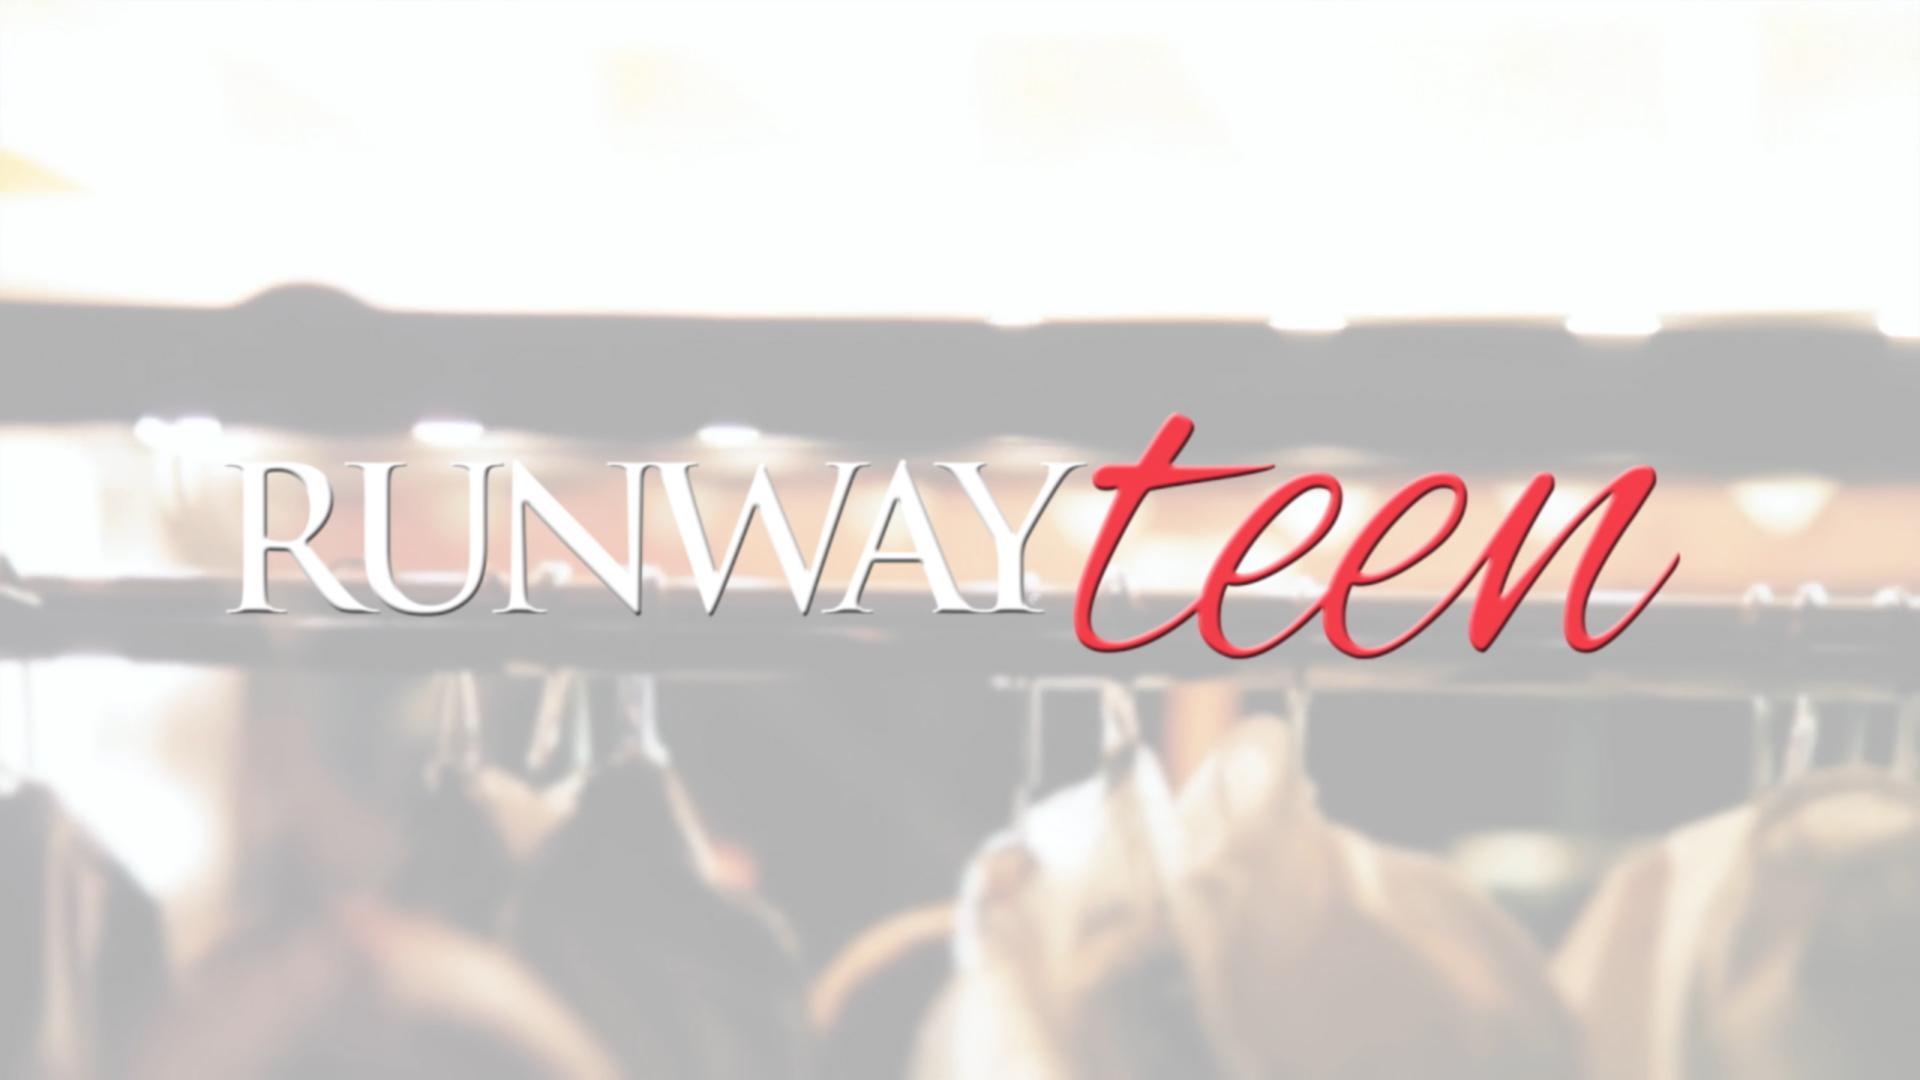 RUNWAY TEEN